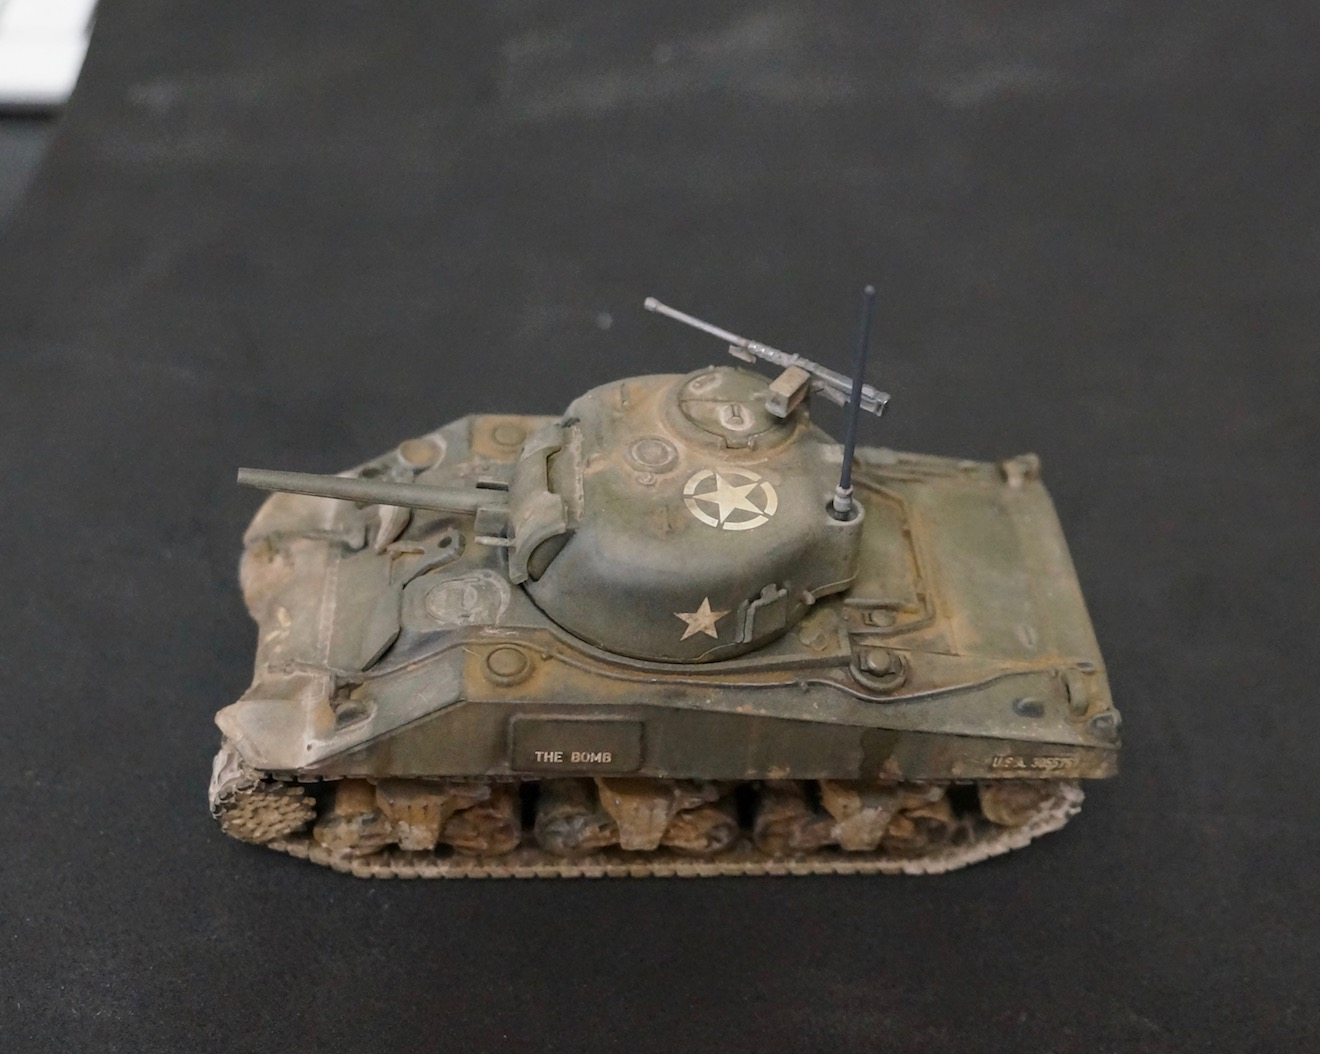 40k Hobby Blog: Bolt Action Sherman Tank eBay Experiment